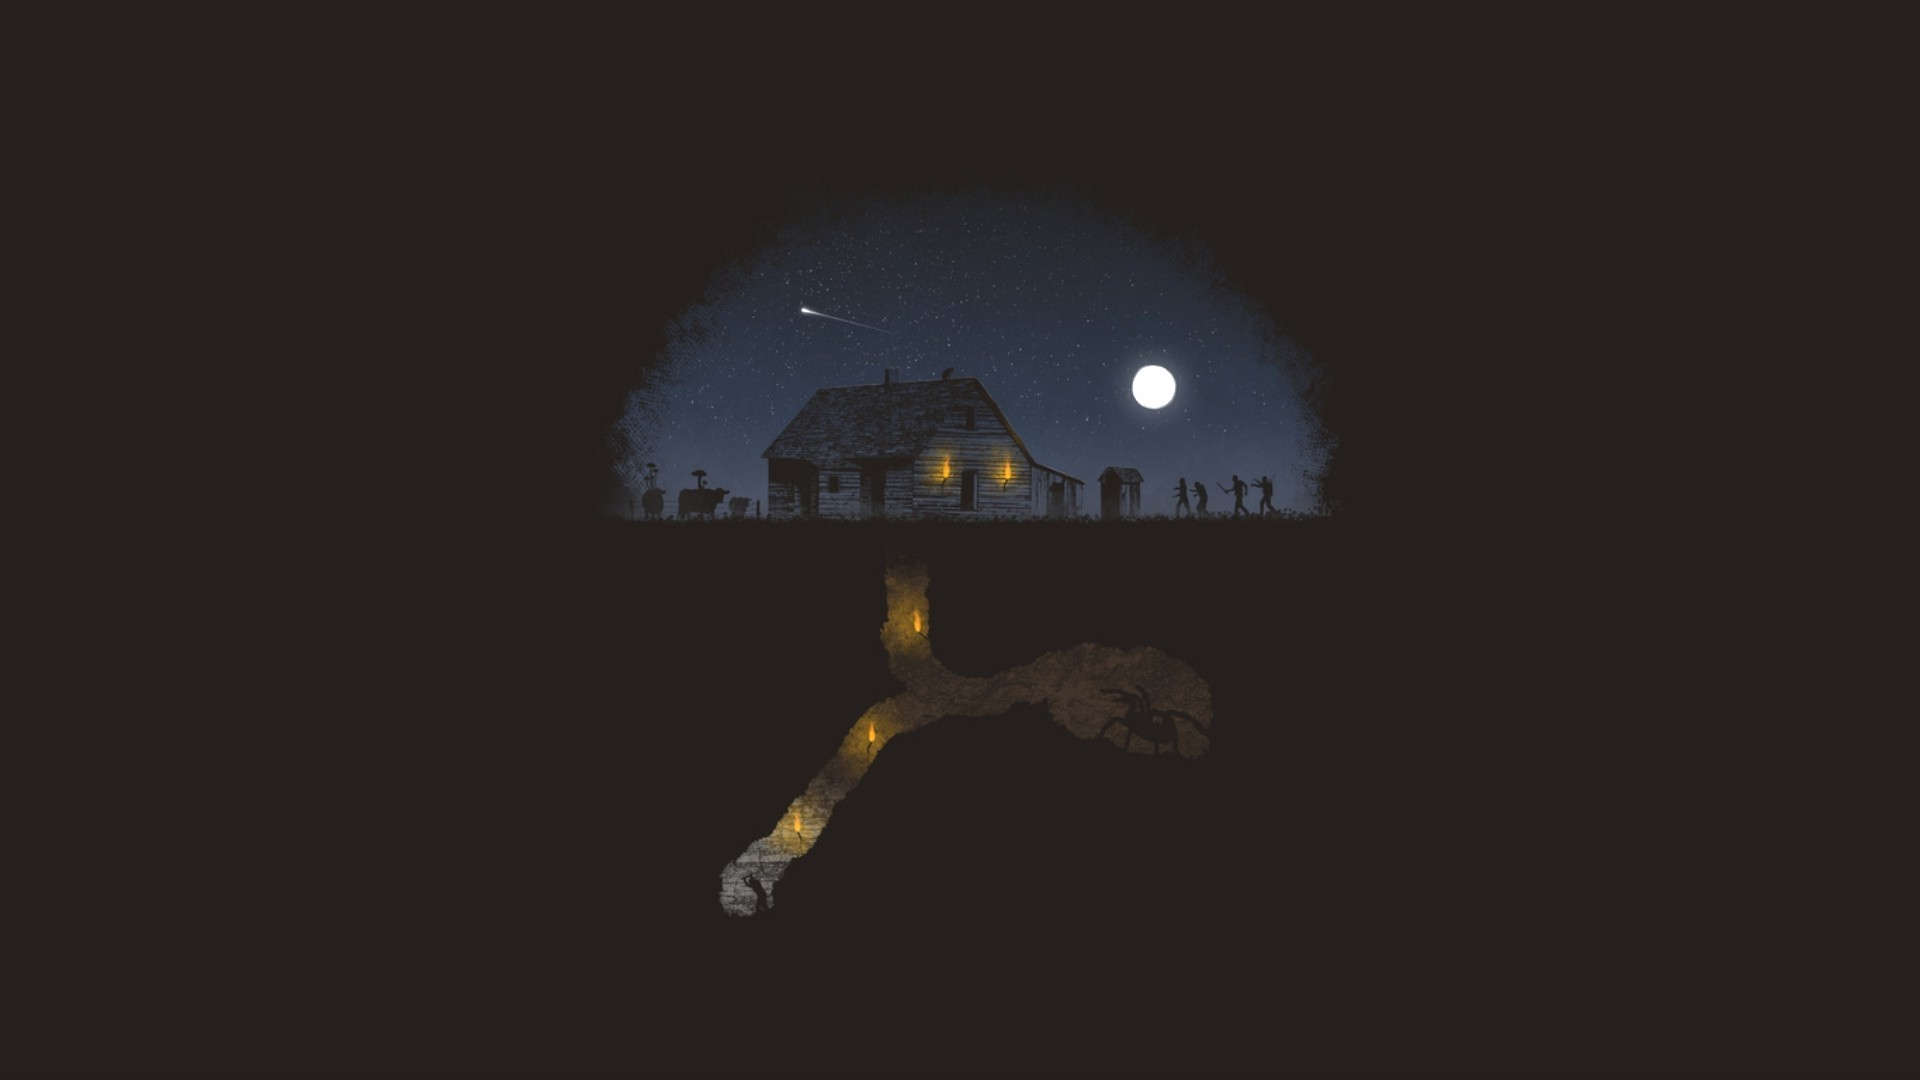 spider, Minimalism, Minecraft, Zombies. Half Life, Black Mesa Wallpaper HD